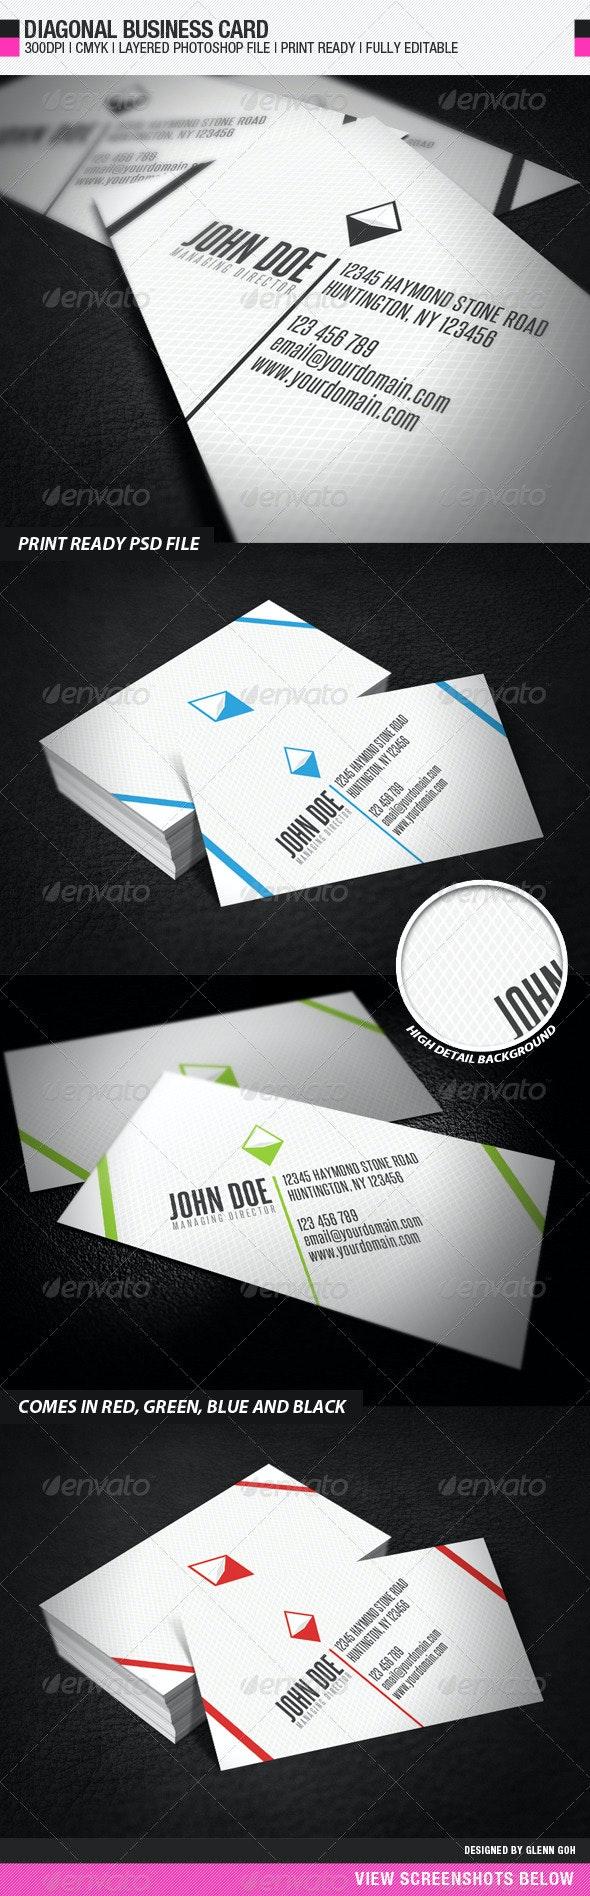 Diagonal Business Card - Creative Business Cards